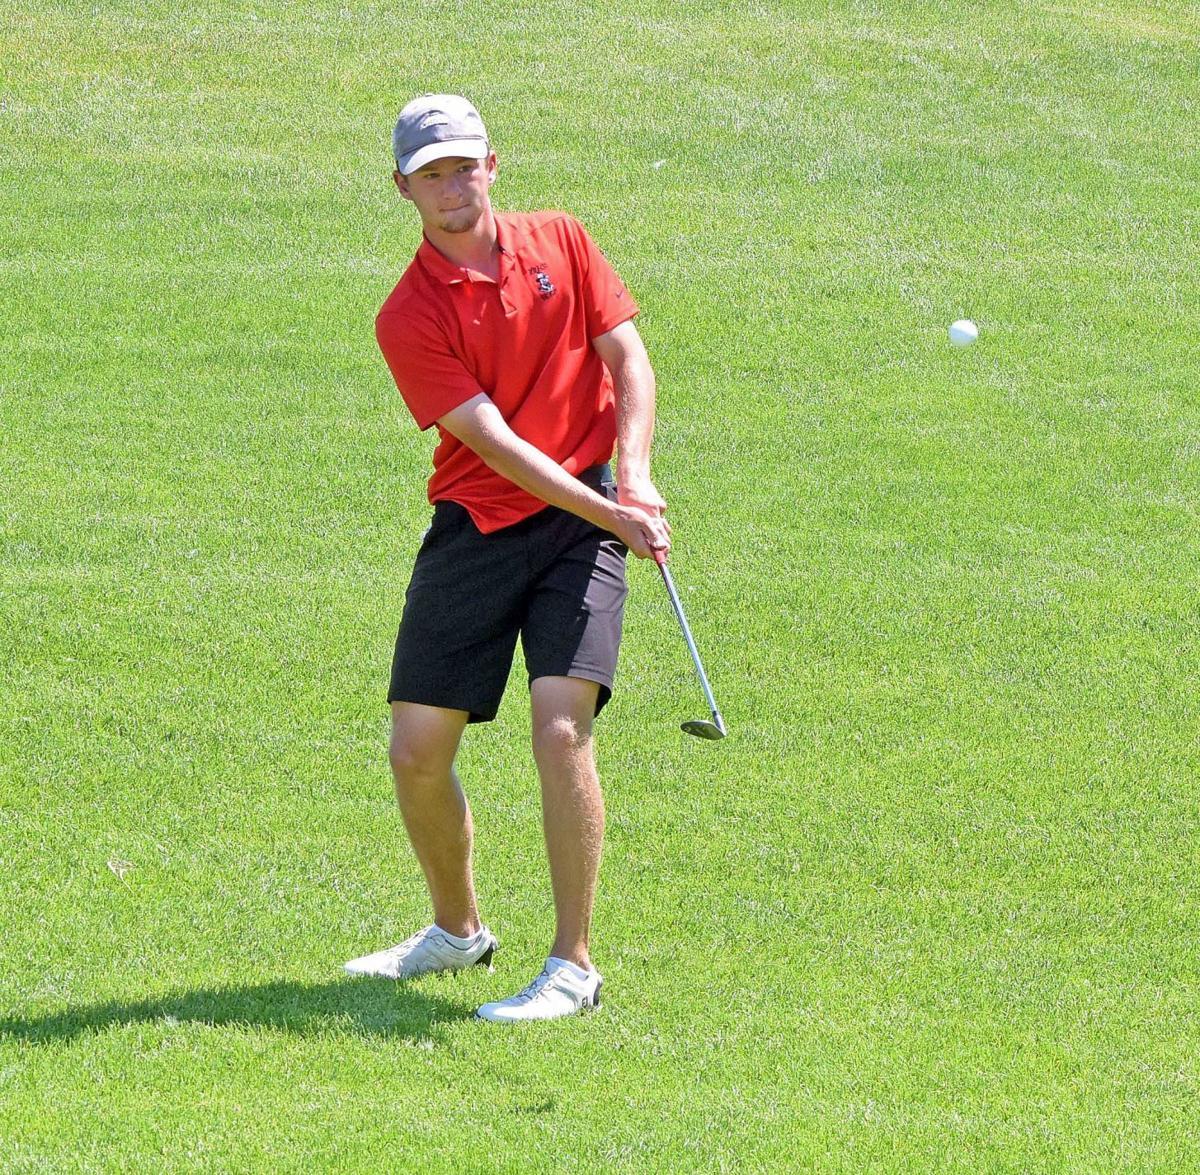 061031-spt-golf6.jpg